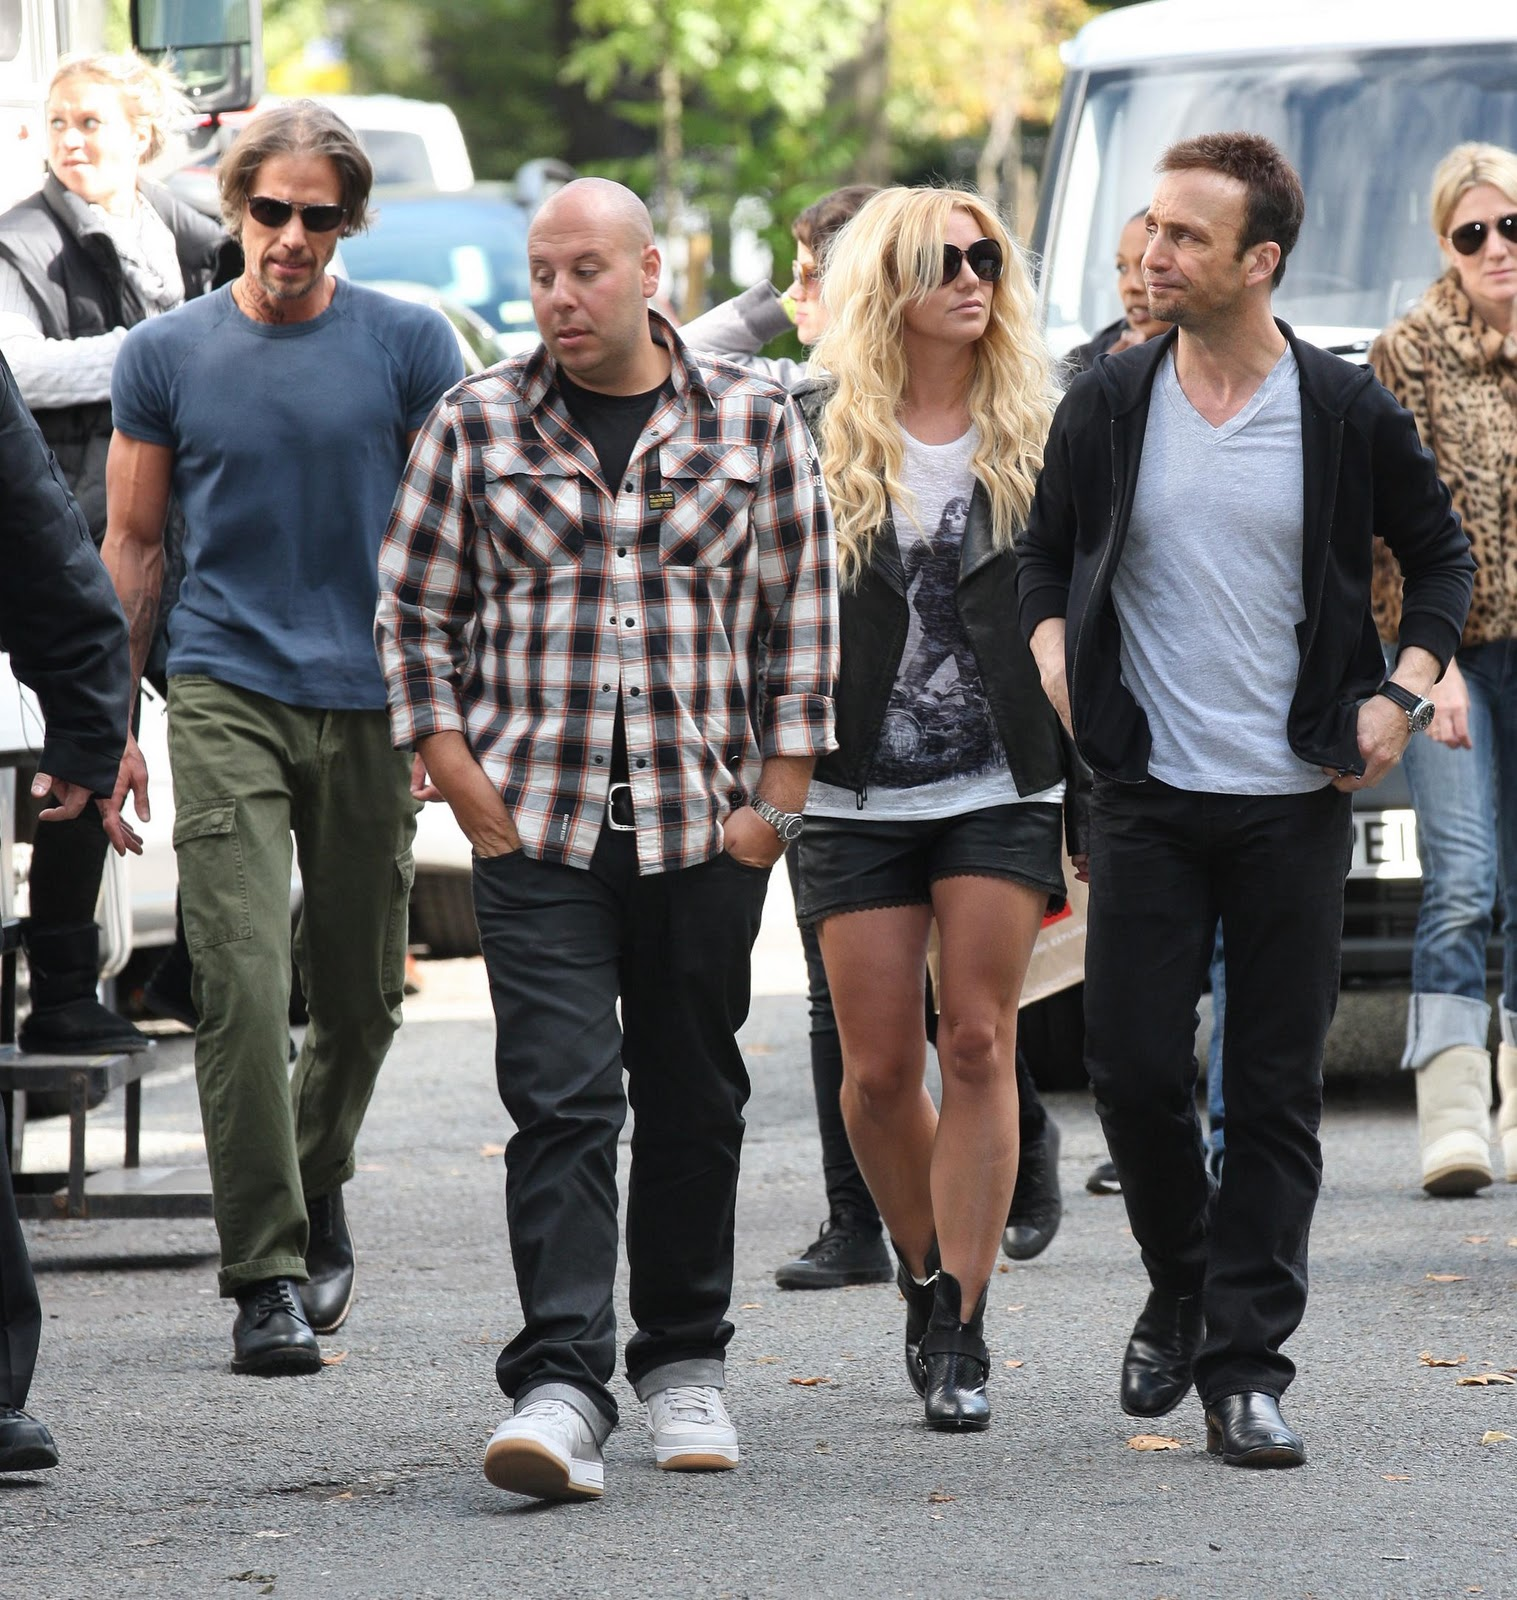 http://1.bp.blogspot.com/-0UDJOuIAj-0/TndyCnCtCPI/AAAAAAAAD9s/sFIAapcuwns/s1600/Just-spotted-Britney-Spears-in-Dalston-with-a-gun-no-biggie6.jpg